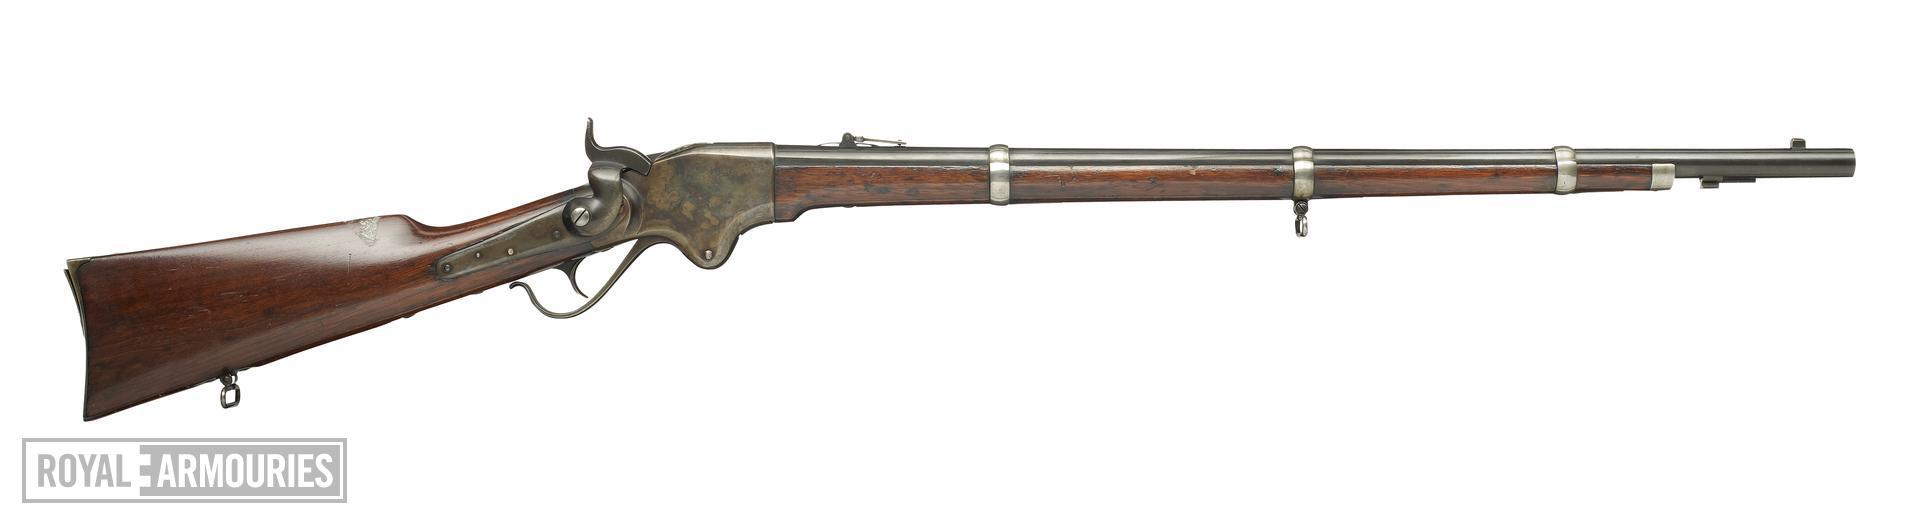 Rimfire lever-action magazine rifle - Spencer 1860 Pattern